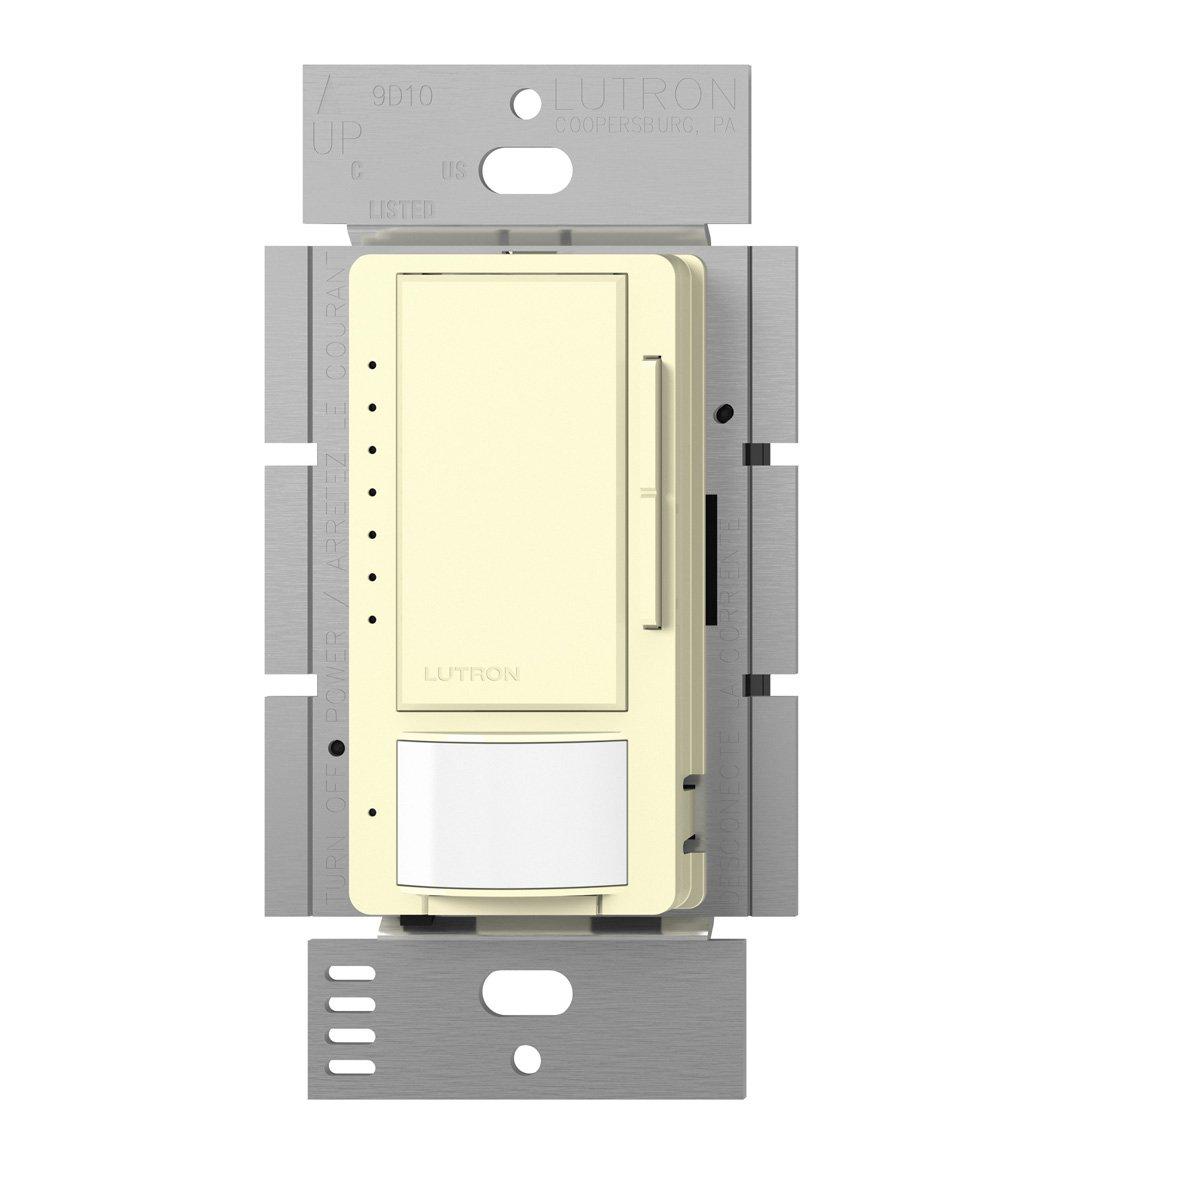 Lutron MSCL-VP153M-AL Maestro CL Single Pole Multi Location Vacancy Sensing Dimmer, Almond by Lutron B00FQL1T30 アーモンド アーモンド